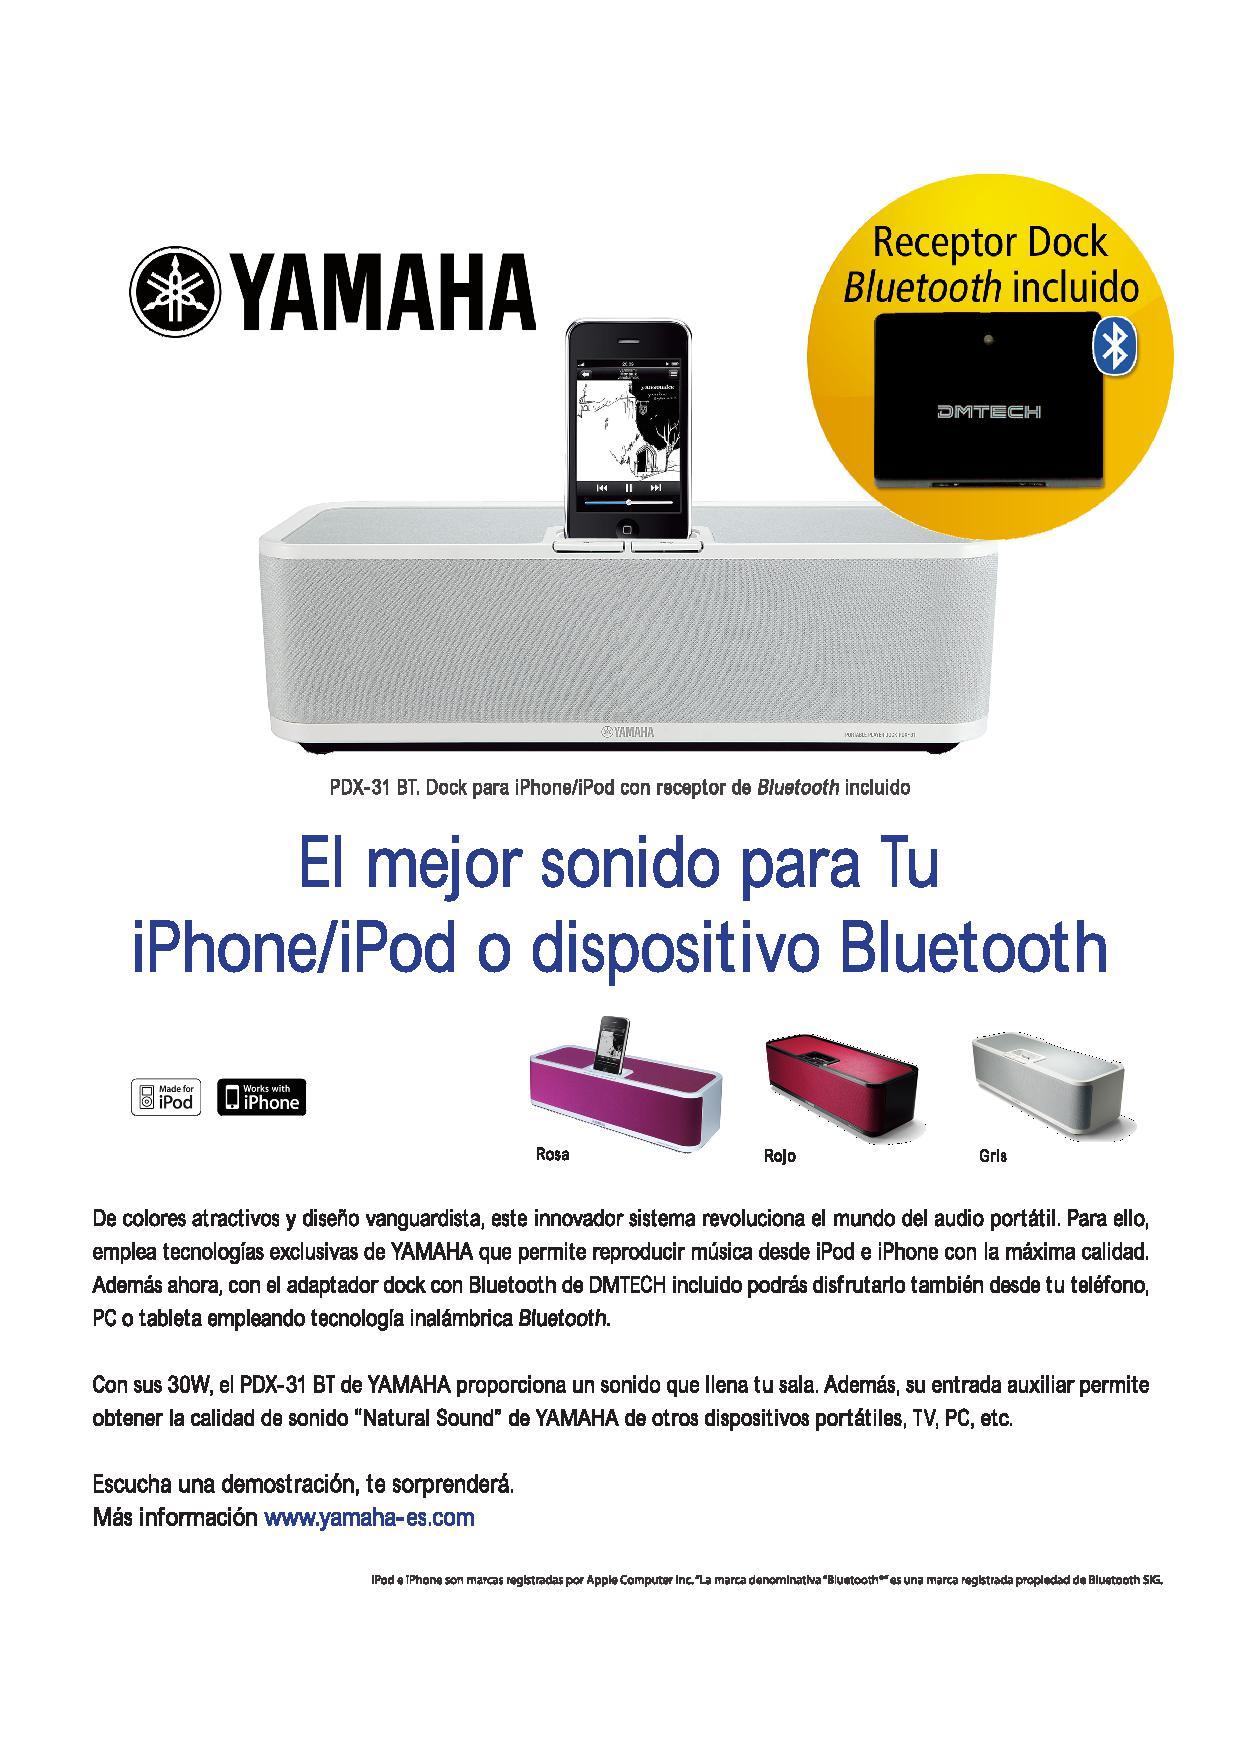 yamaha pdx-31